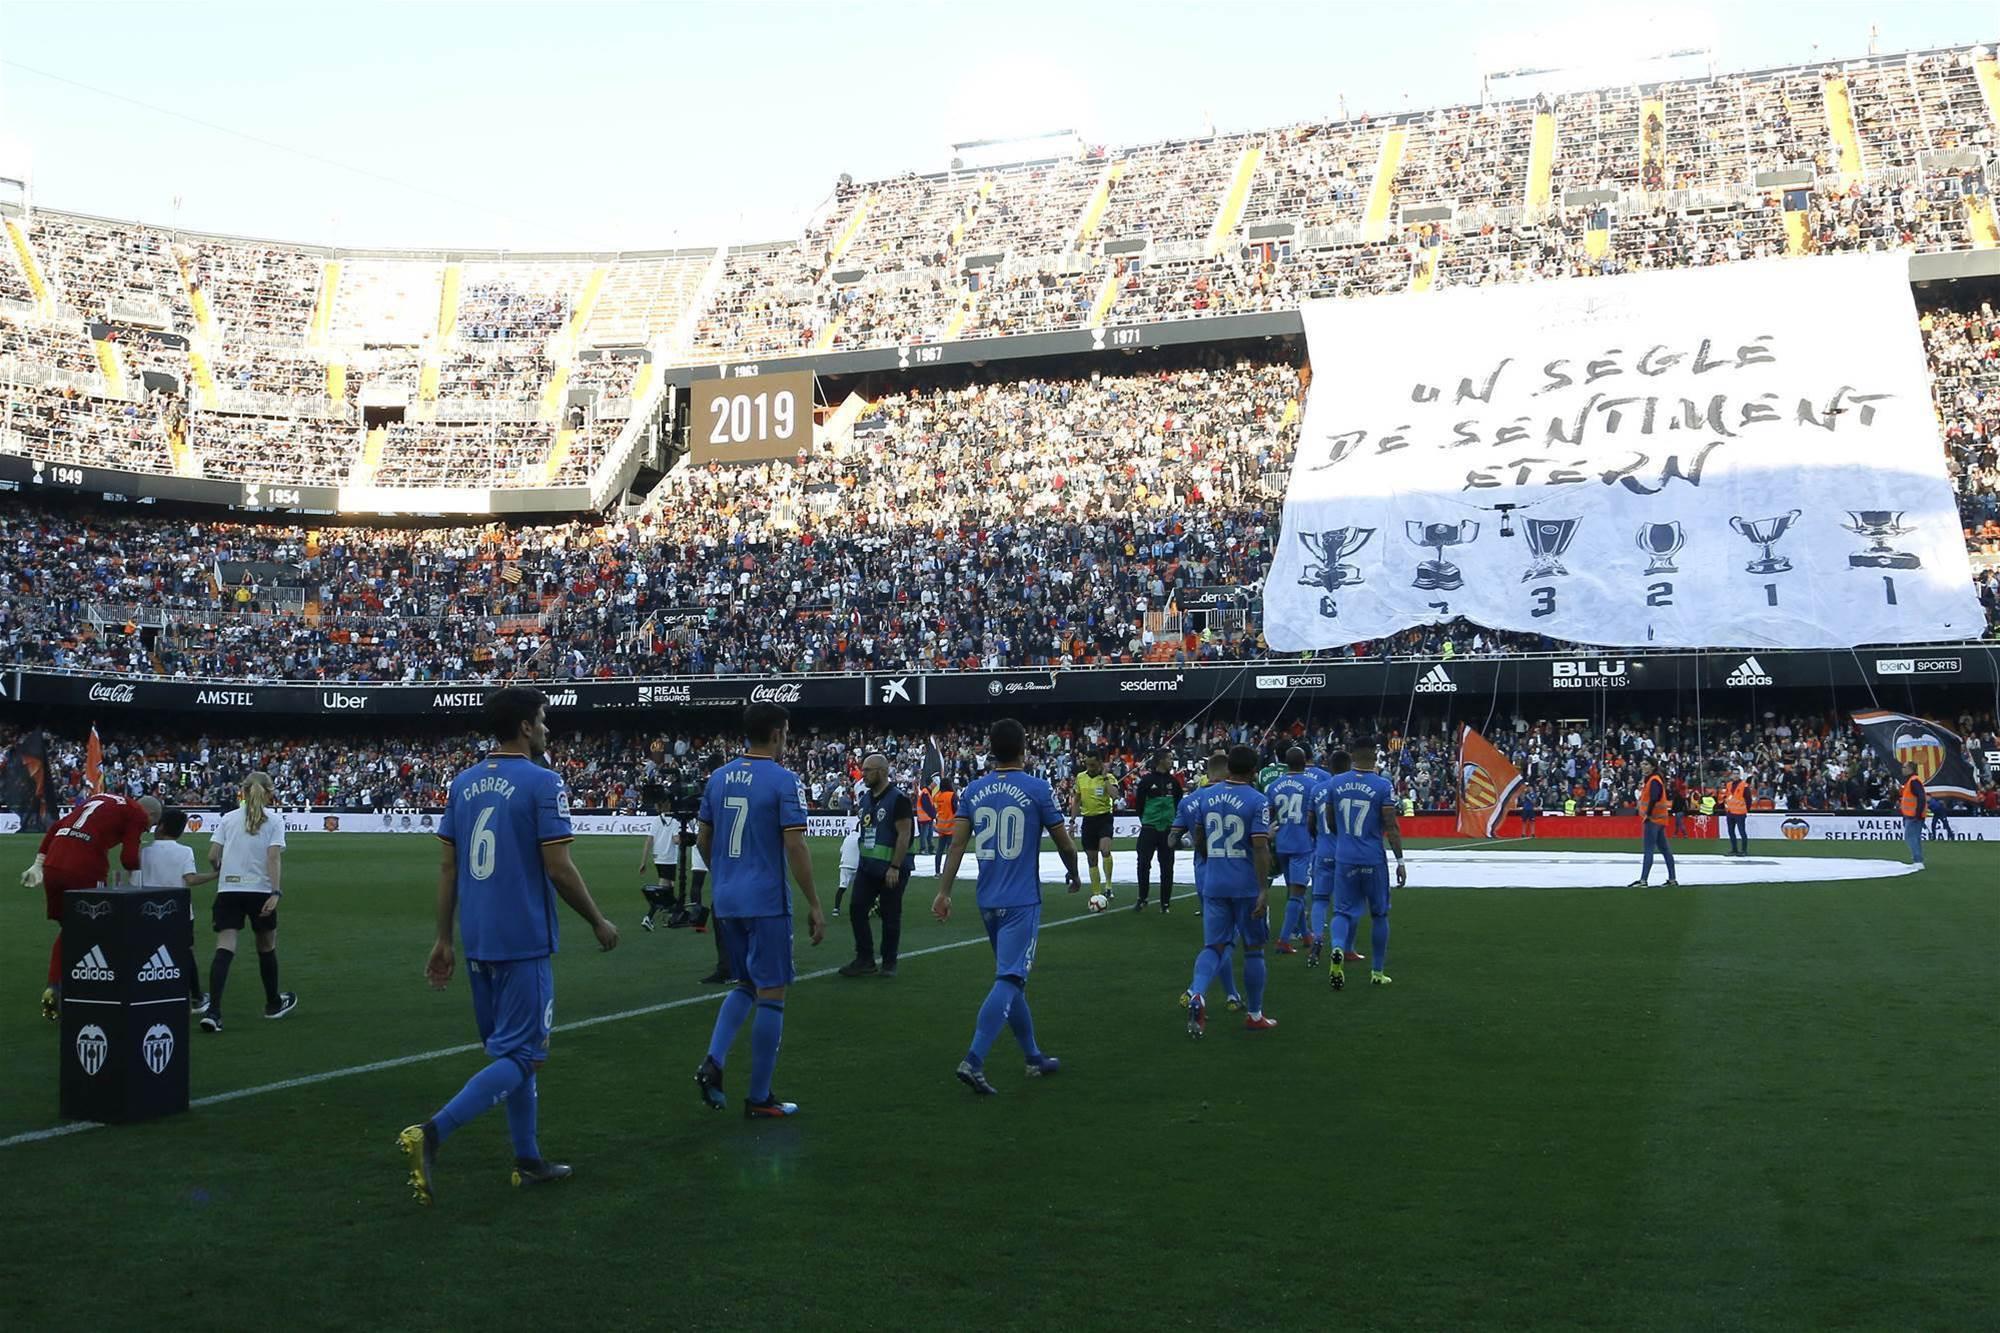 Valencia celebrate 100-year anniversary